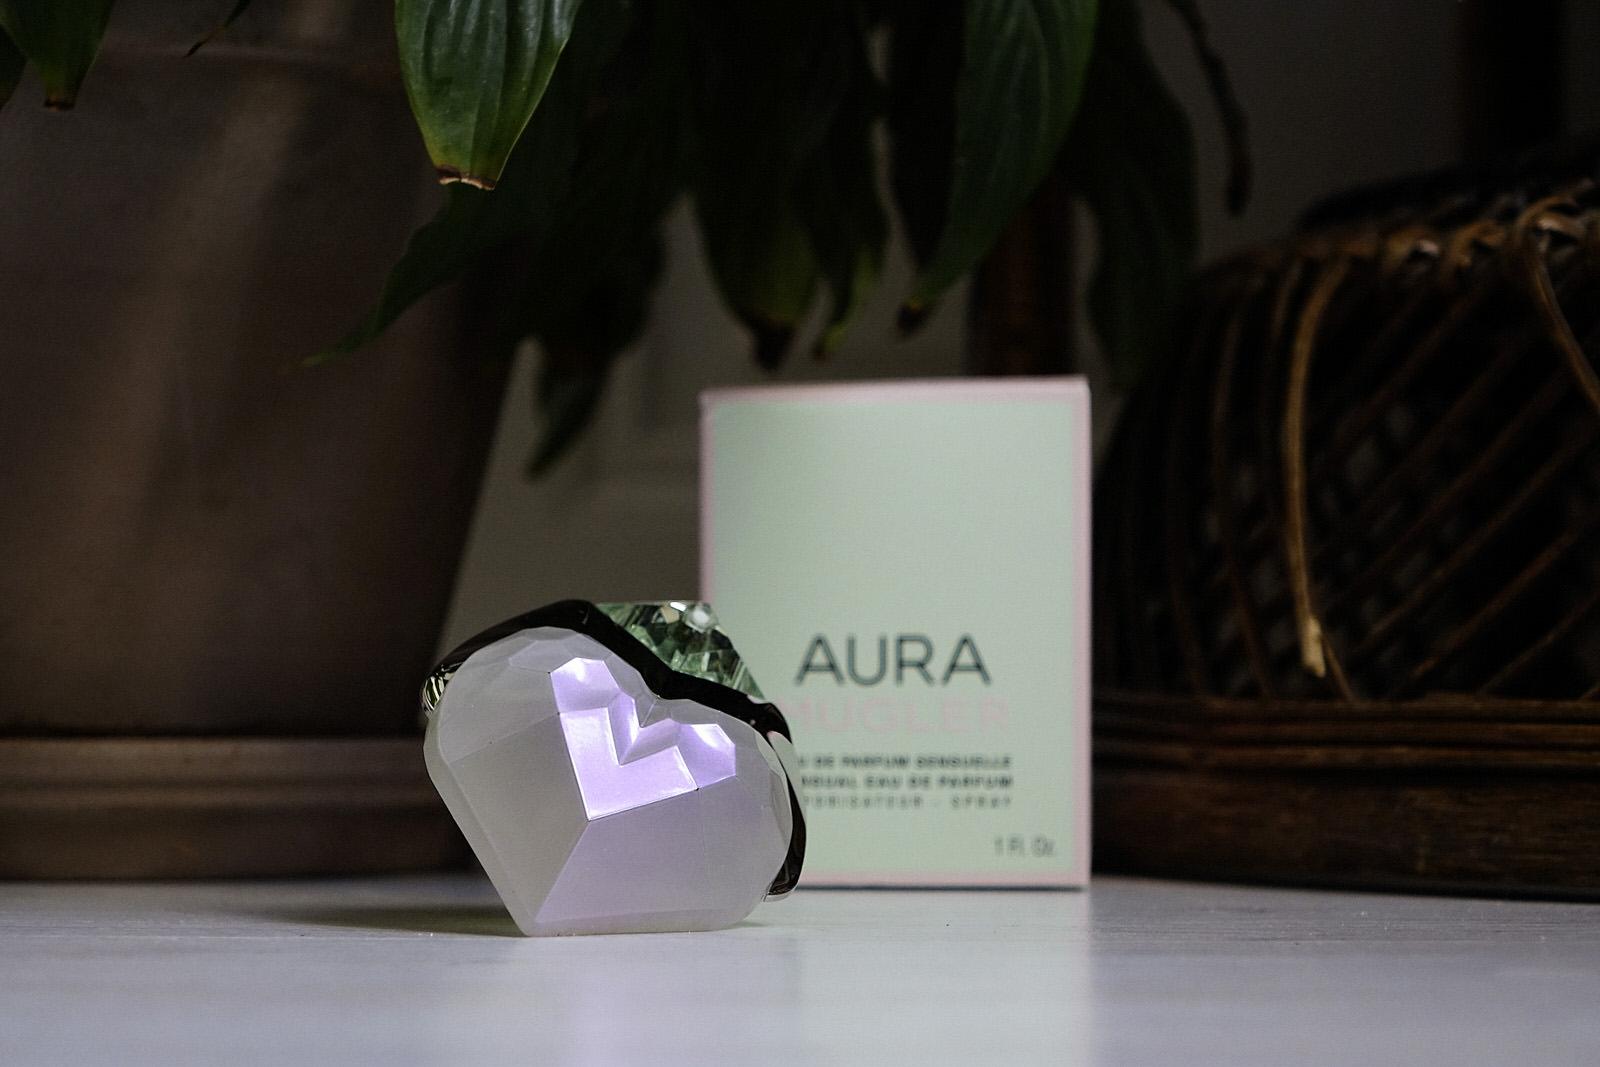 Le parfum Aura de Mugler